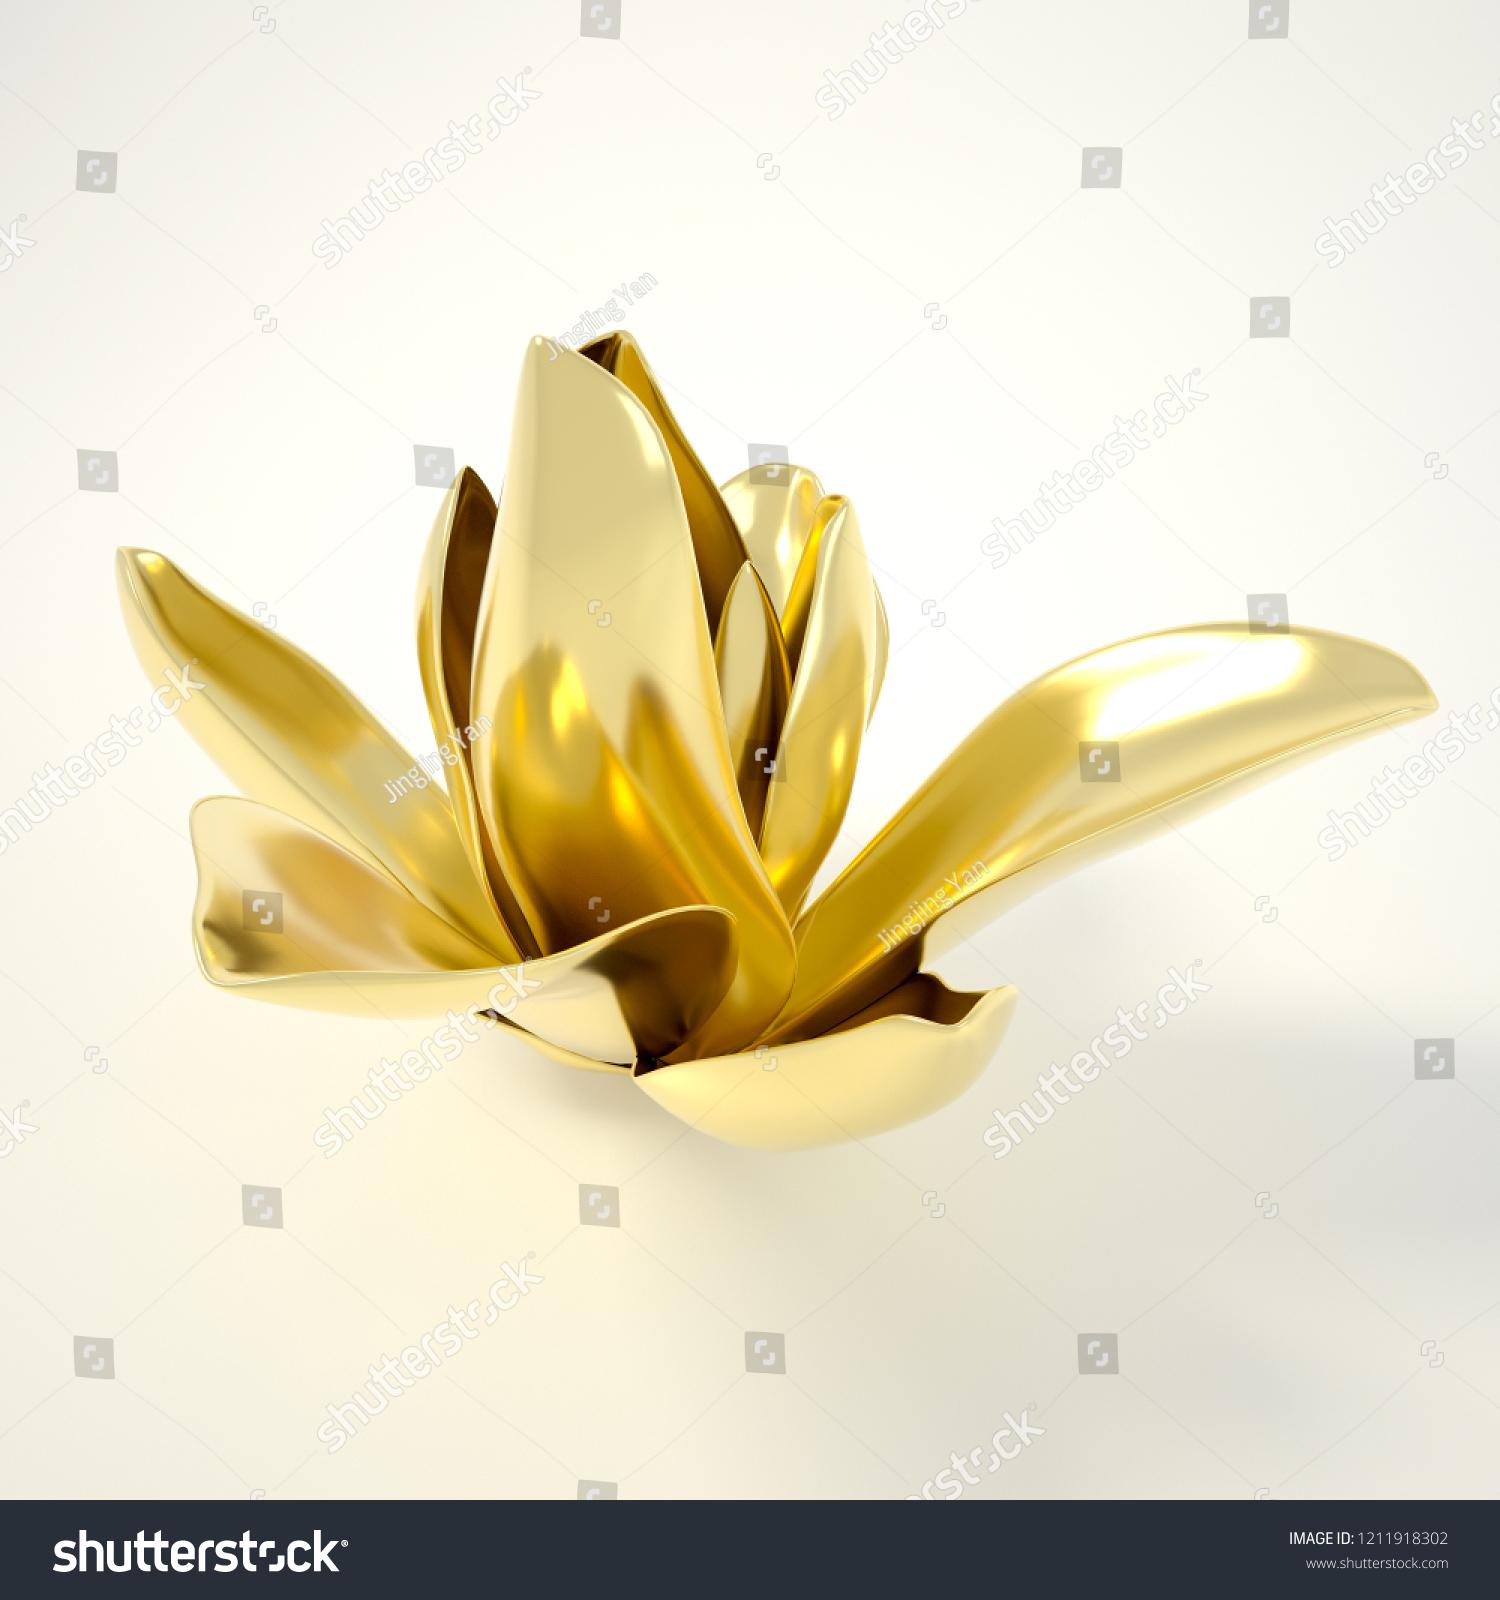 Royalty Free Stock Illustration Of 3 D Rendering Golden Flowers Gold